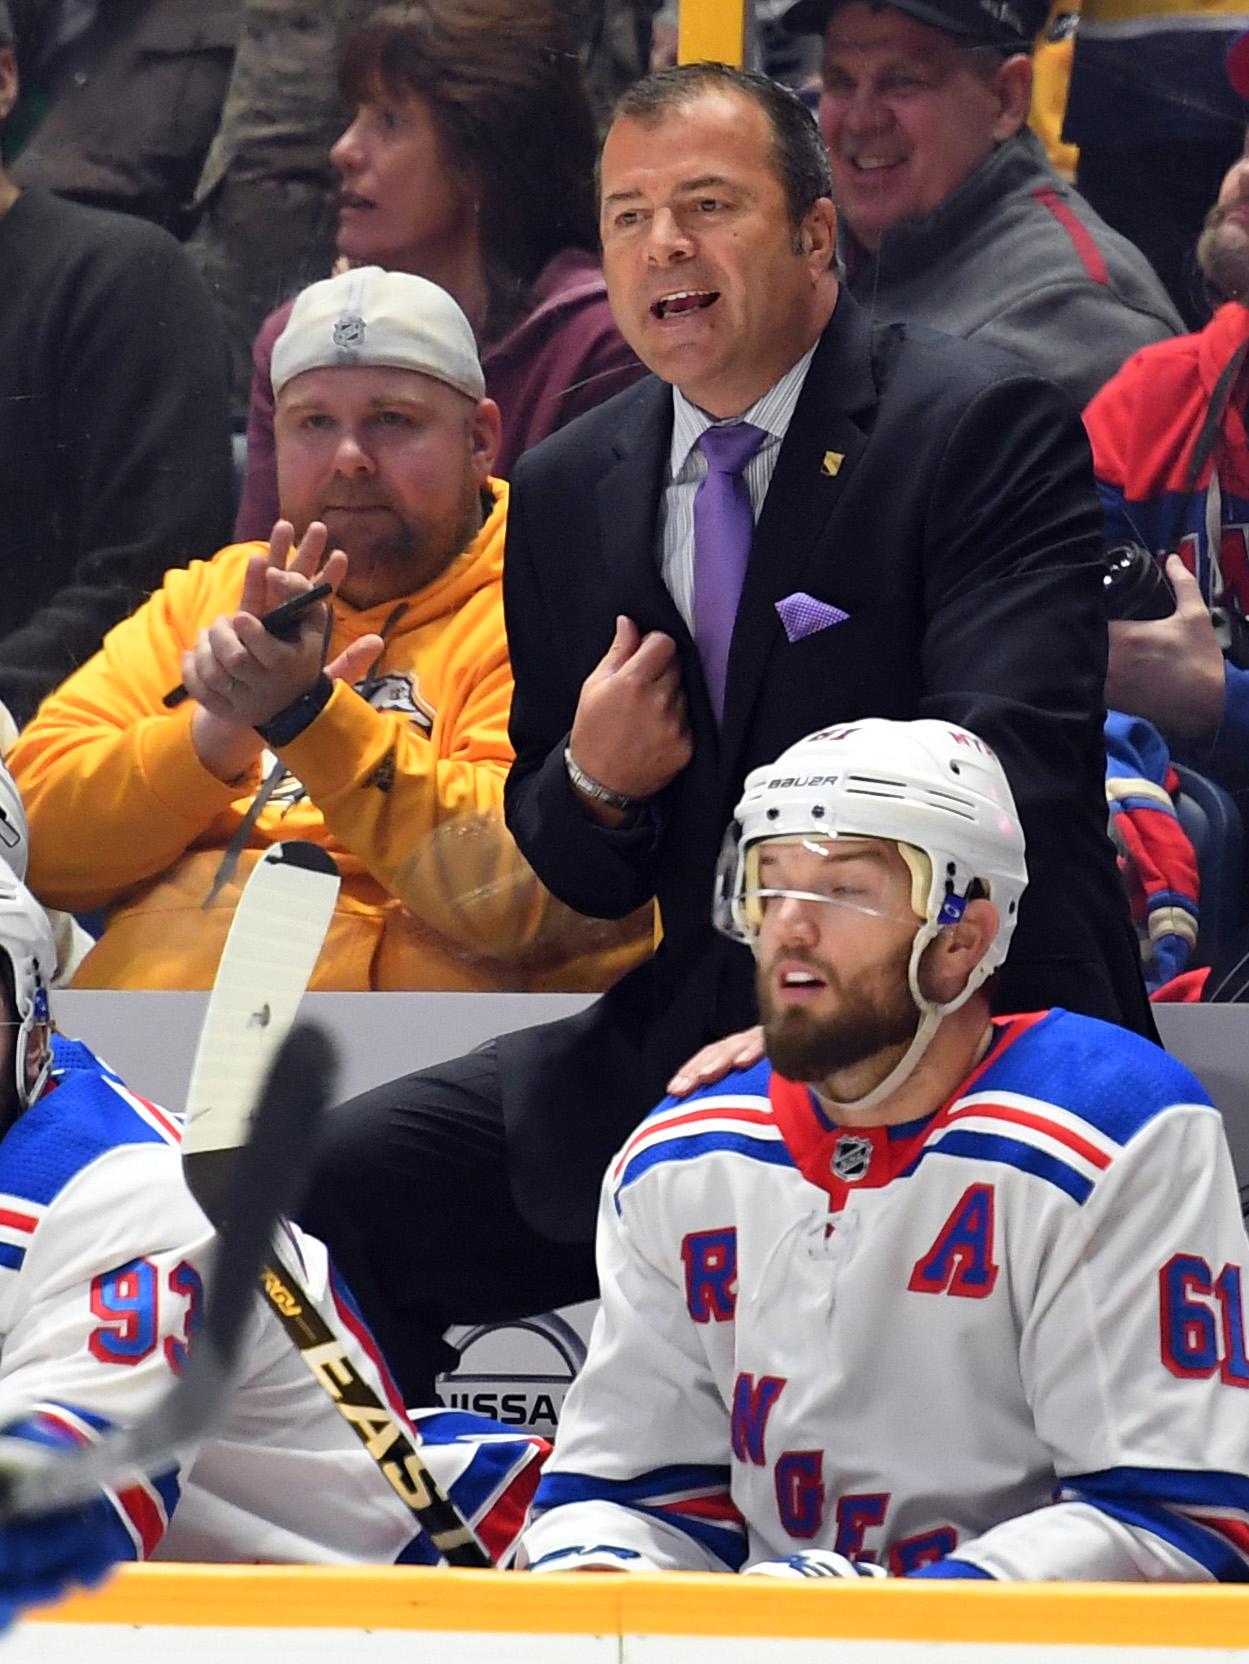 NHL: New York Rangers at Nashville Predators